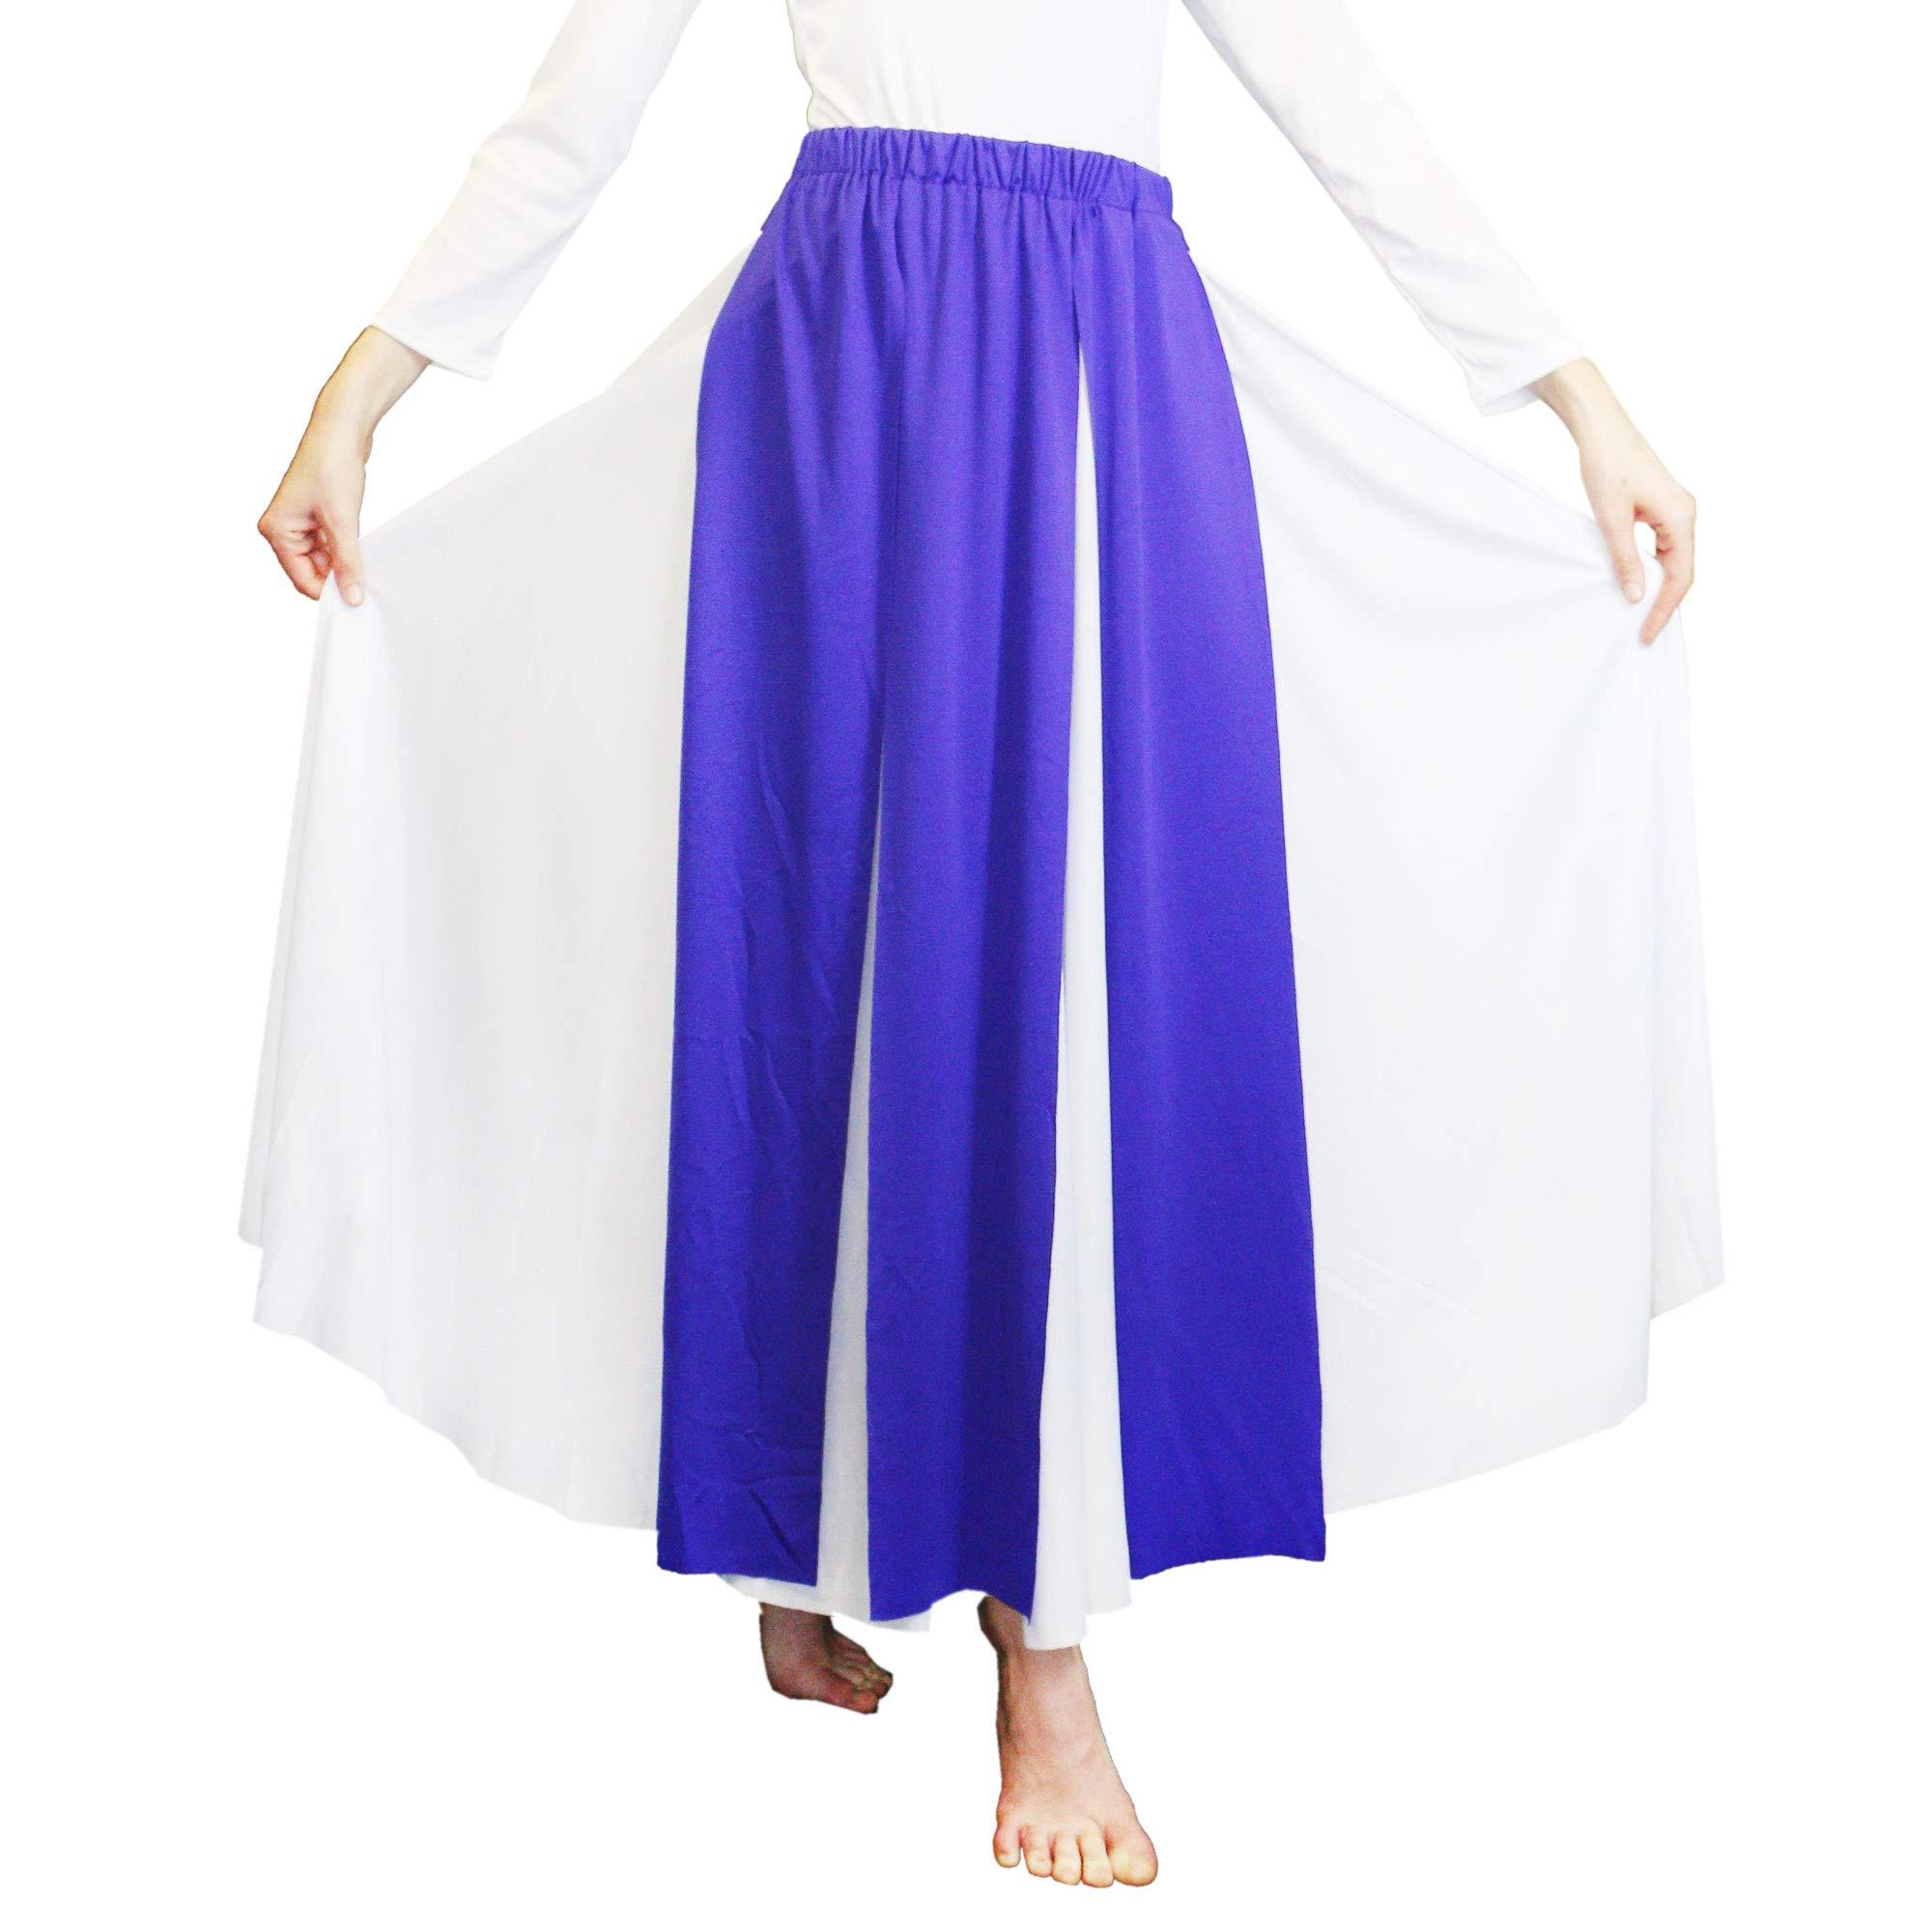 Danzcue Praise Dance Streamer Skirt, Deep Purple, 2X-3X-Adult by Danzcue